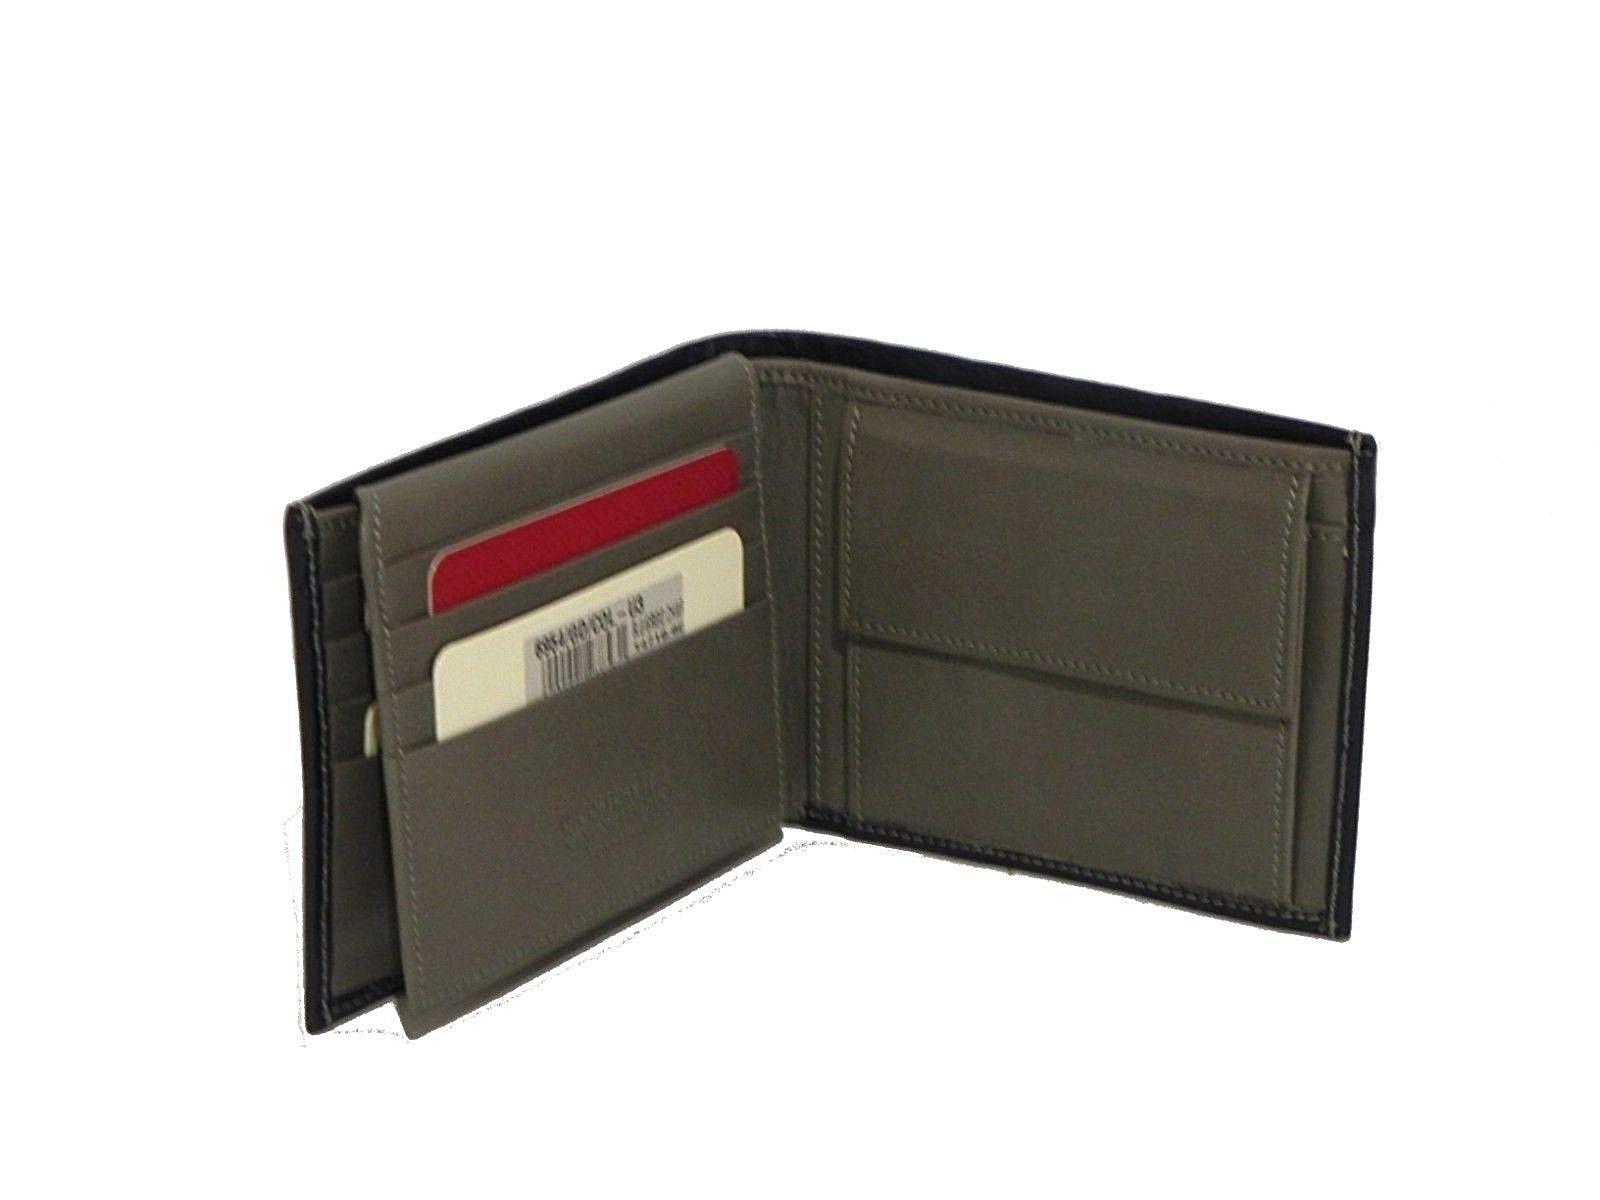 vendita calda online 4f70c f0a73 Portafoglio Giudi uomo portamonete 6954/GD U3 blu/grigio chiaro